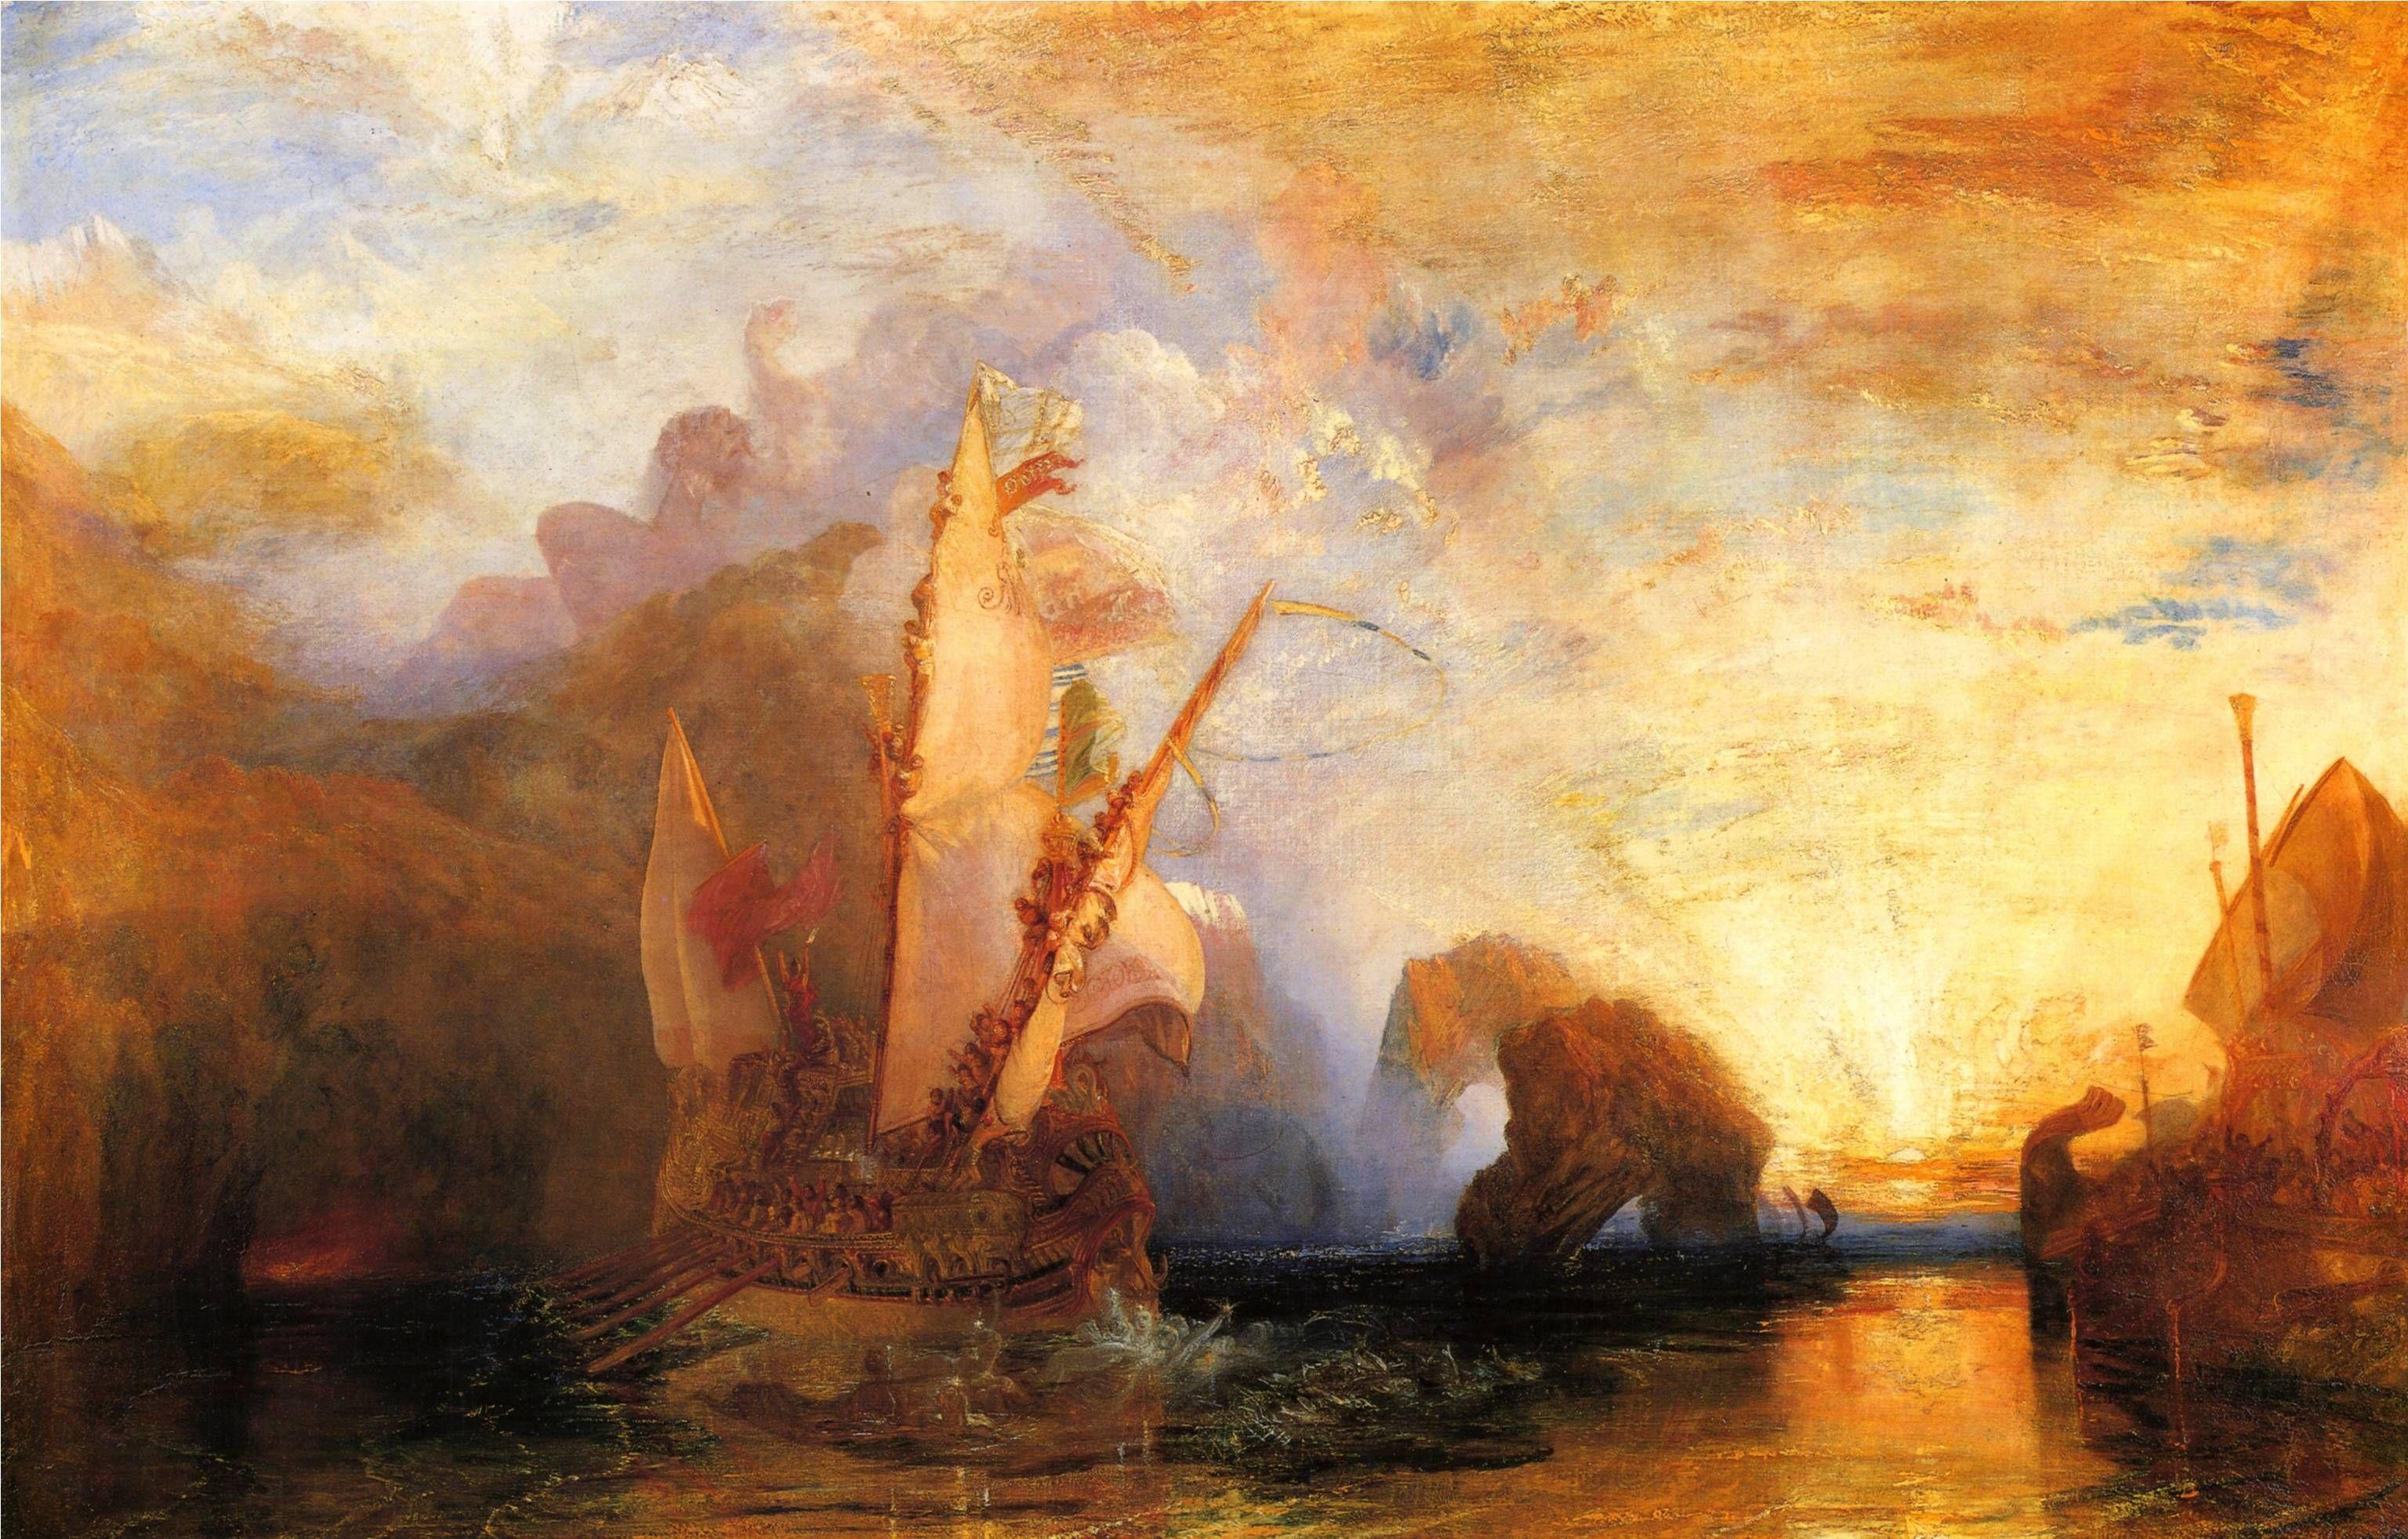 Cross-Curricular Connect: The Slave Ship